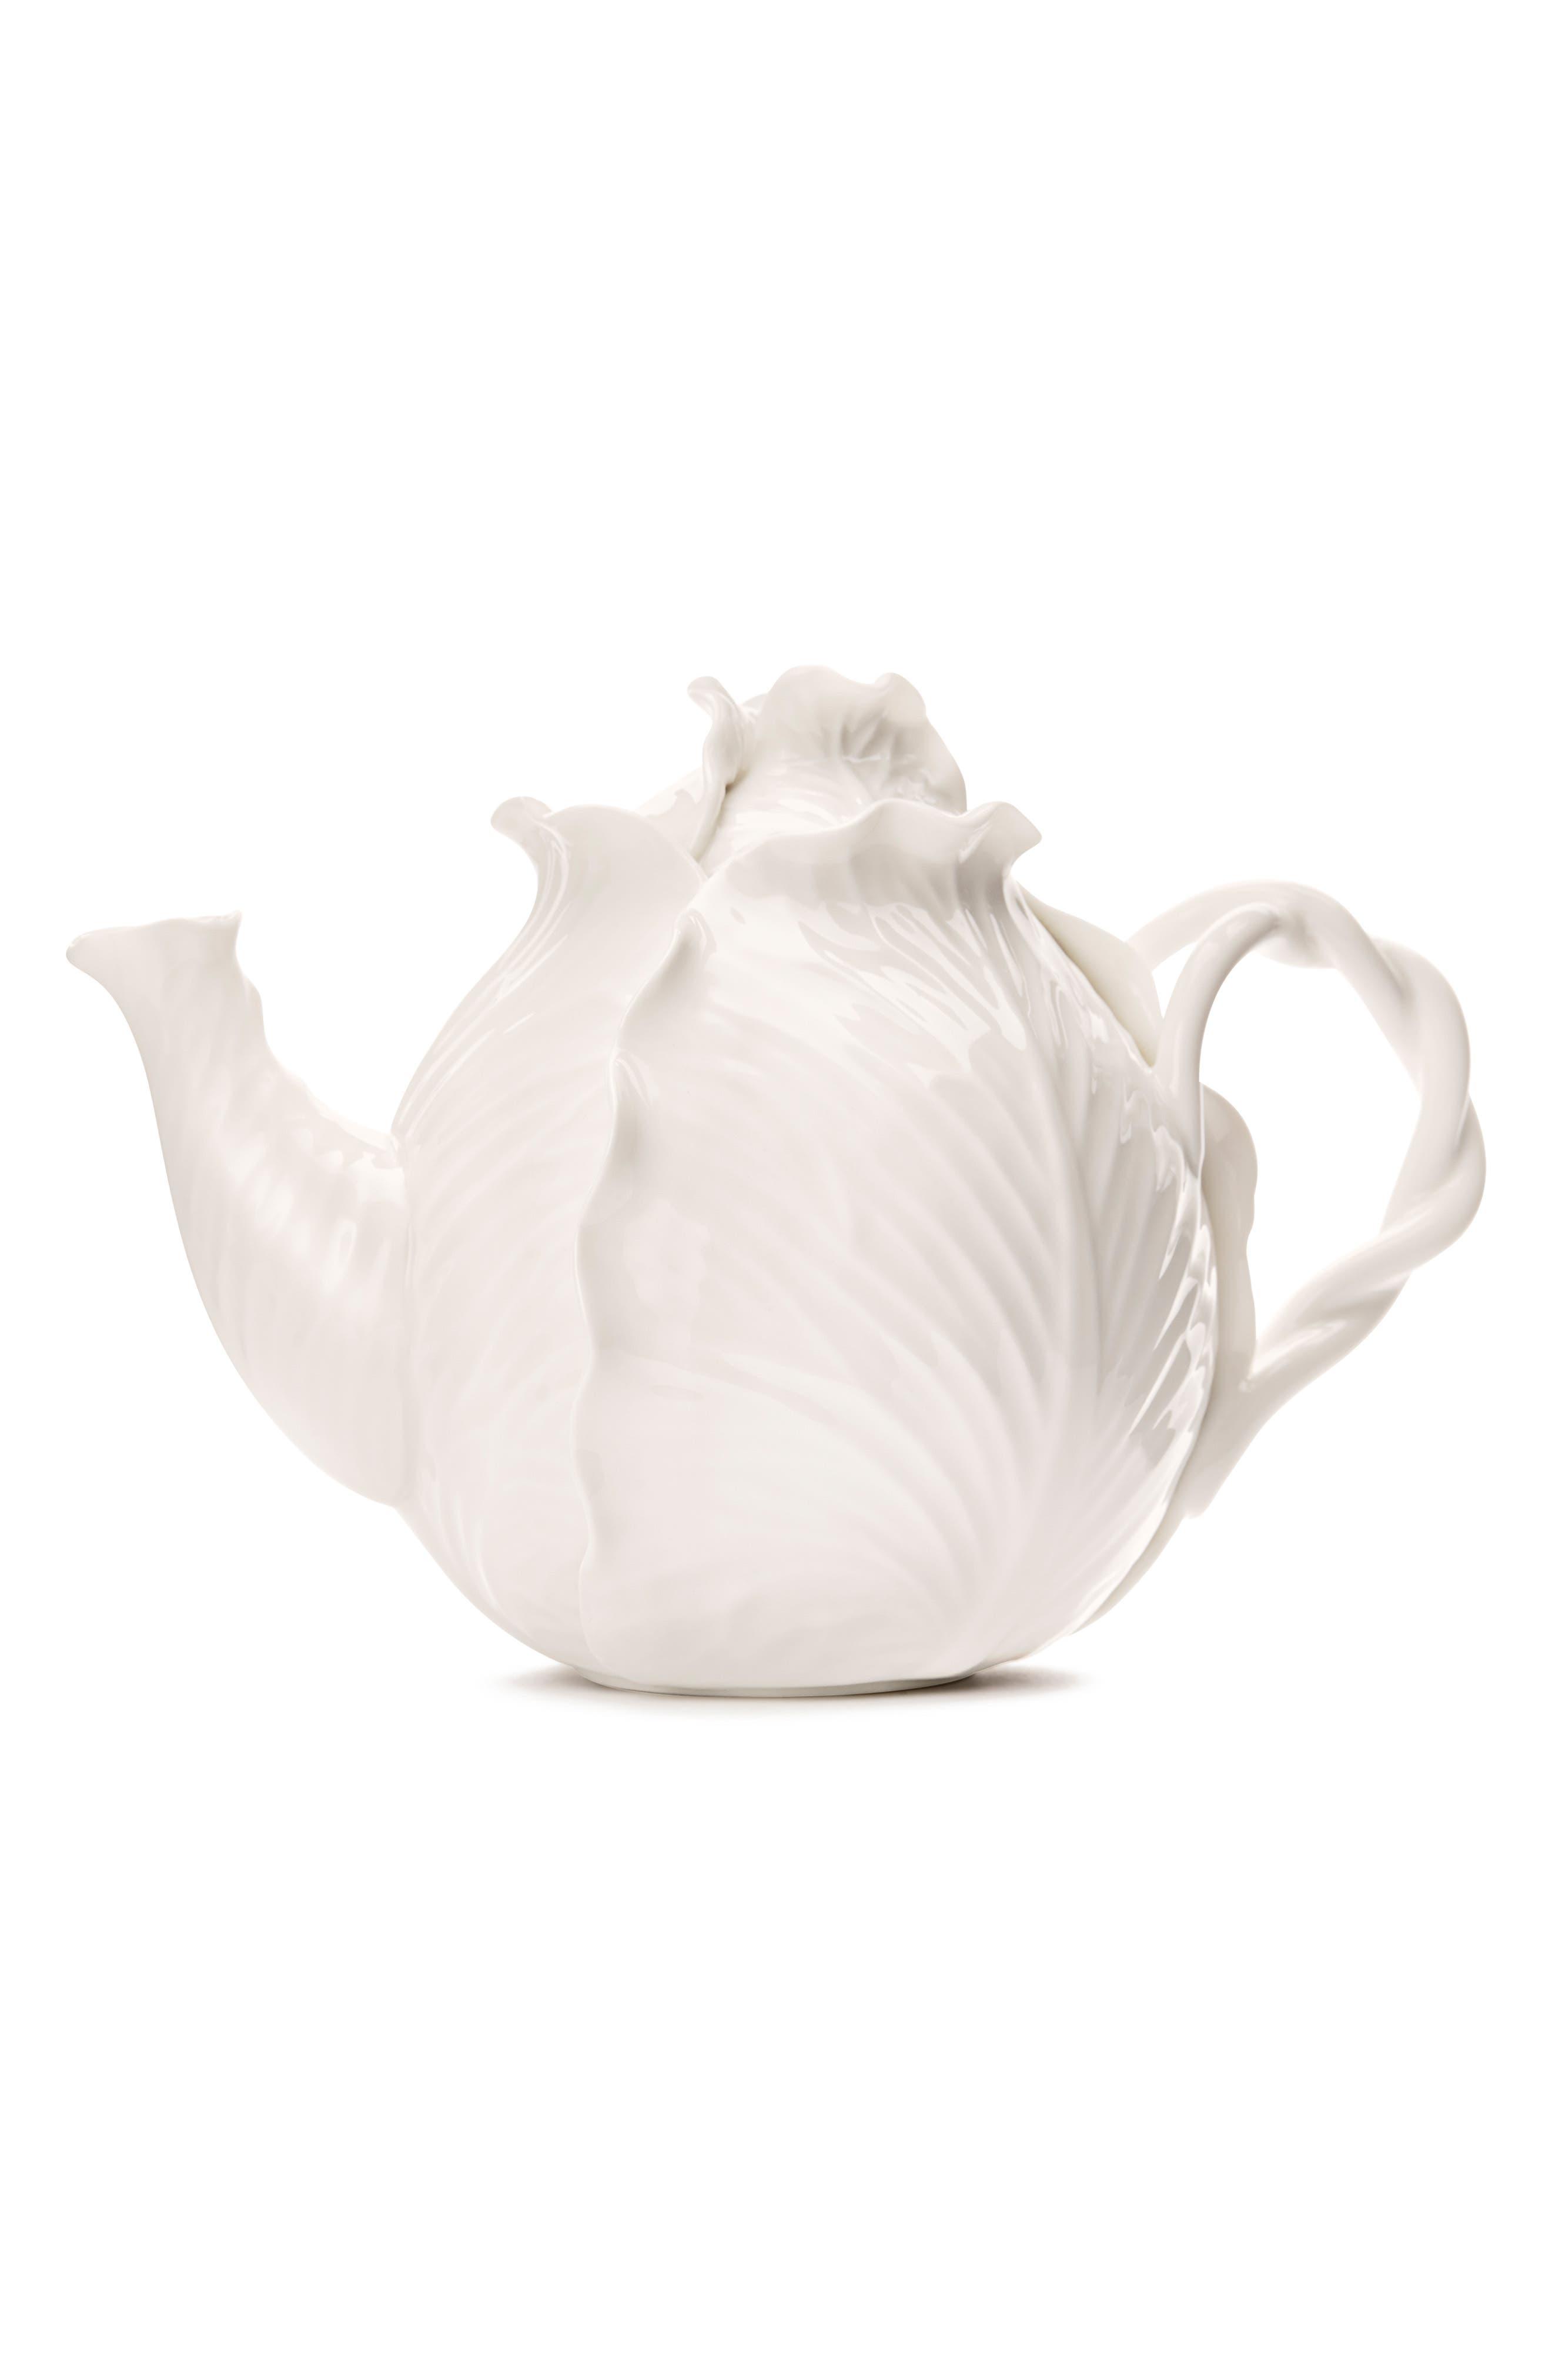 TORY BURCH Lettuce Ware Teapot, Main, color, 100